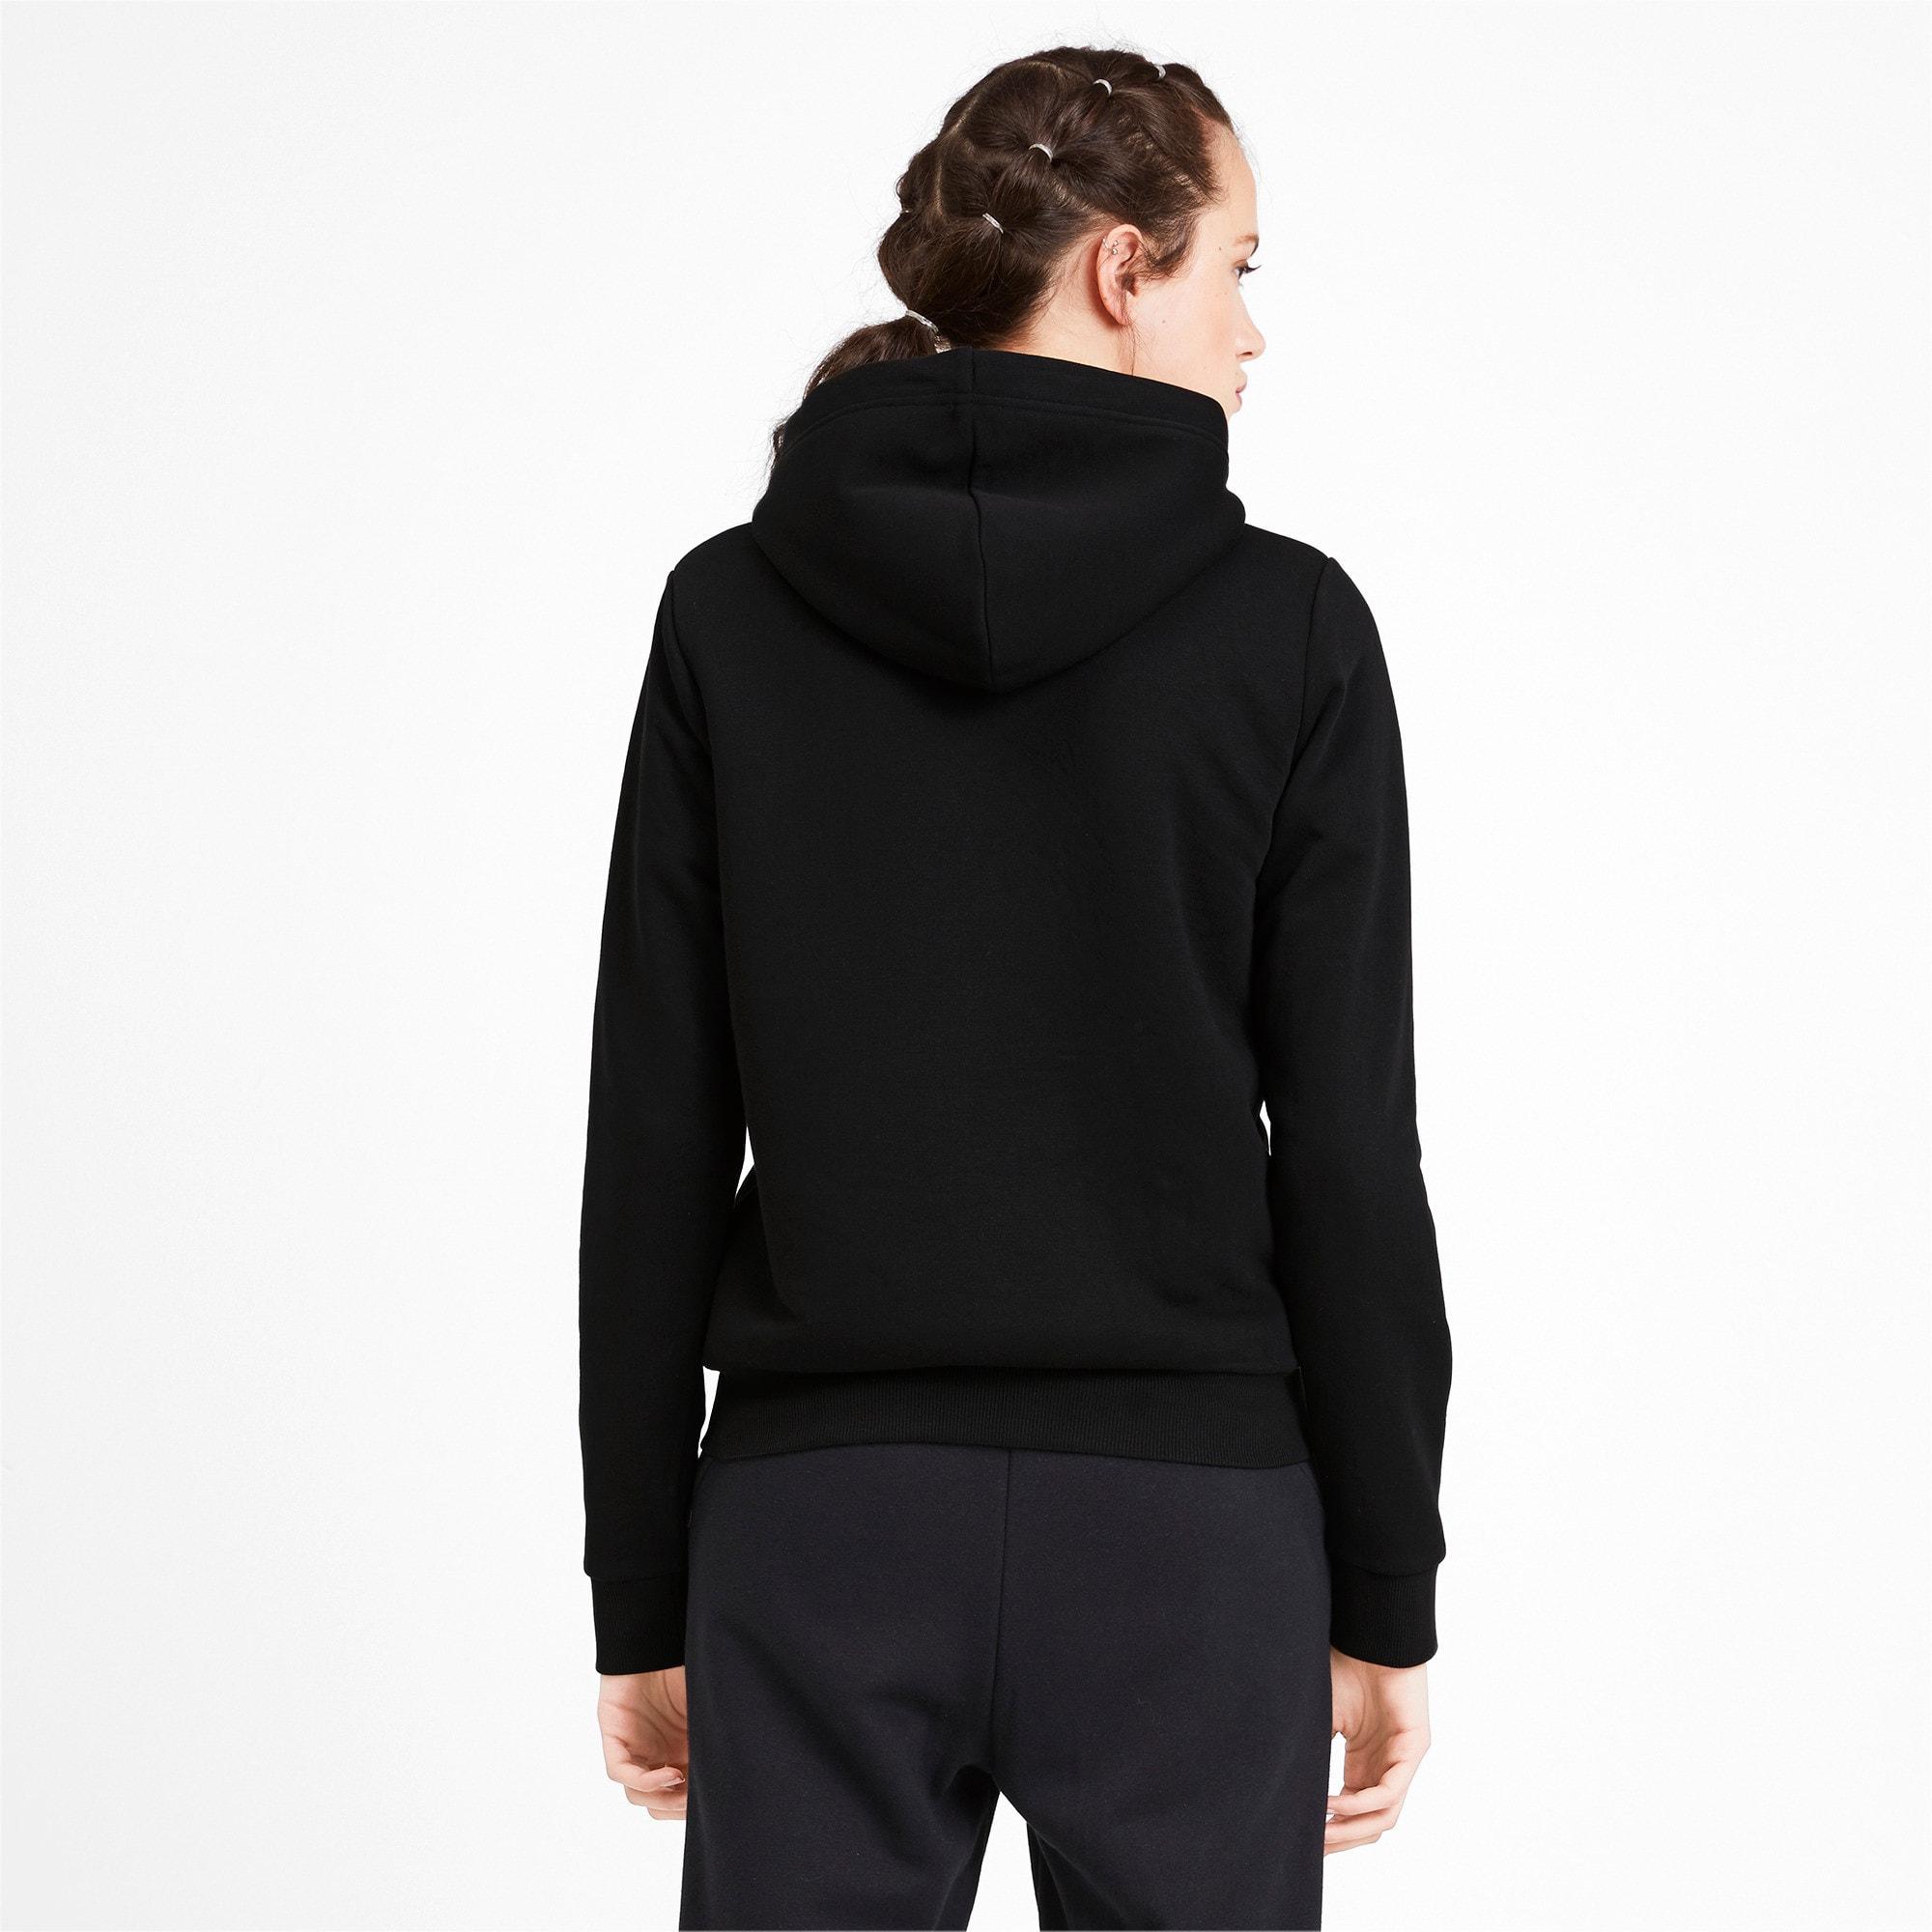 Miniatura 2 de Chaqueta con capucha Essentials + Sherpa para mujer, Cotton Black, mediano